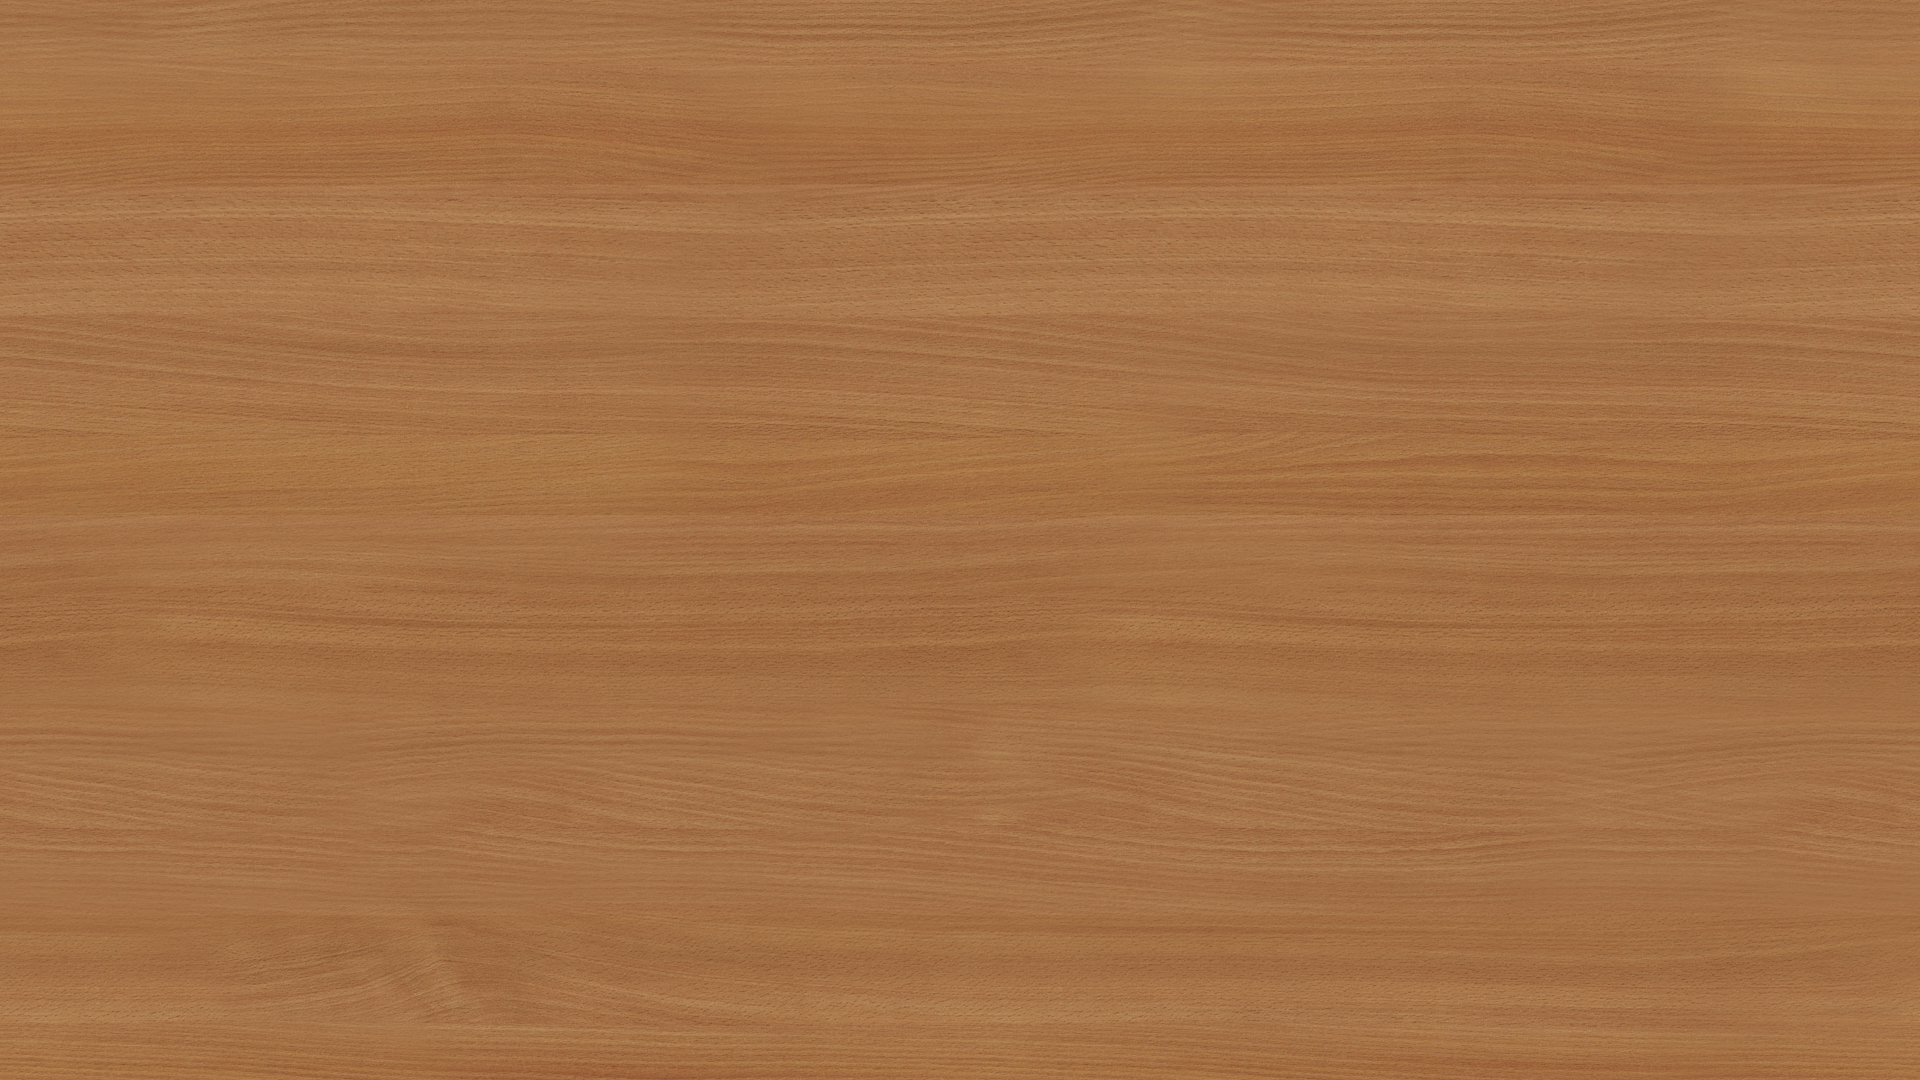 Kronospan 381 - Common beech